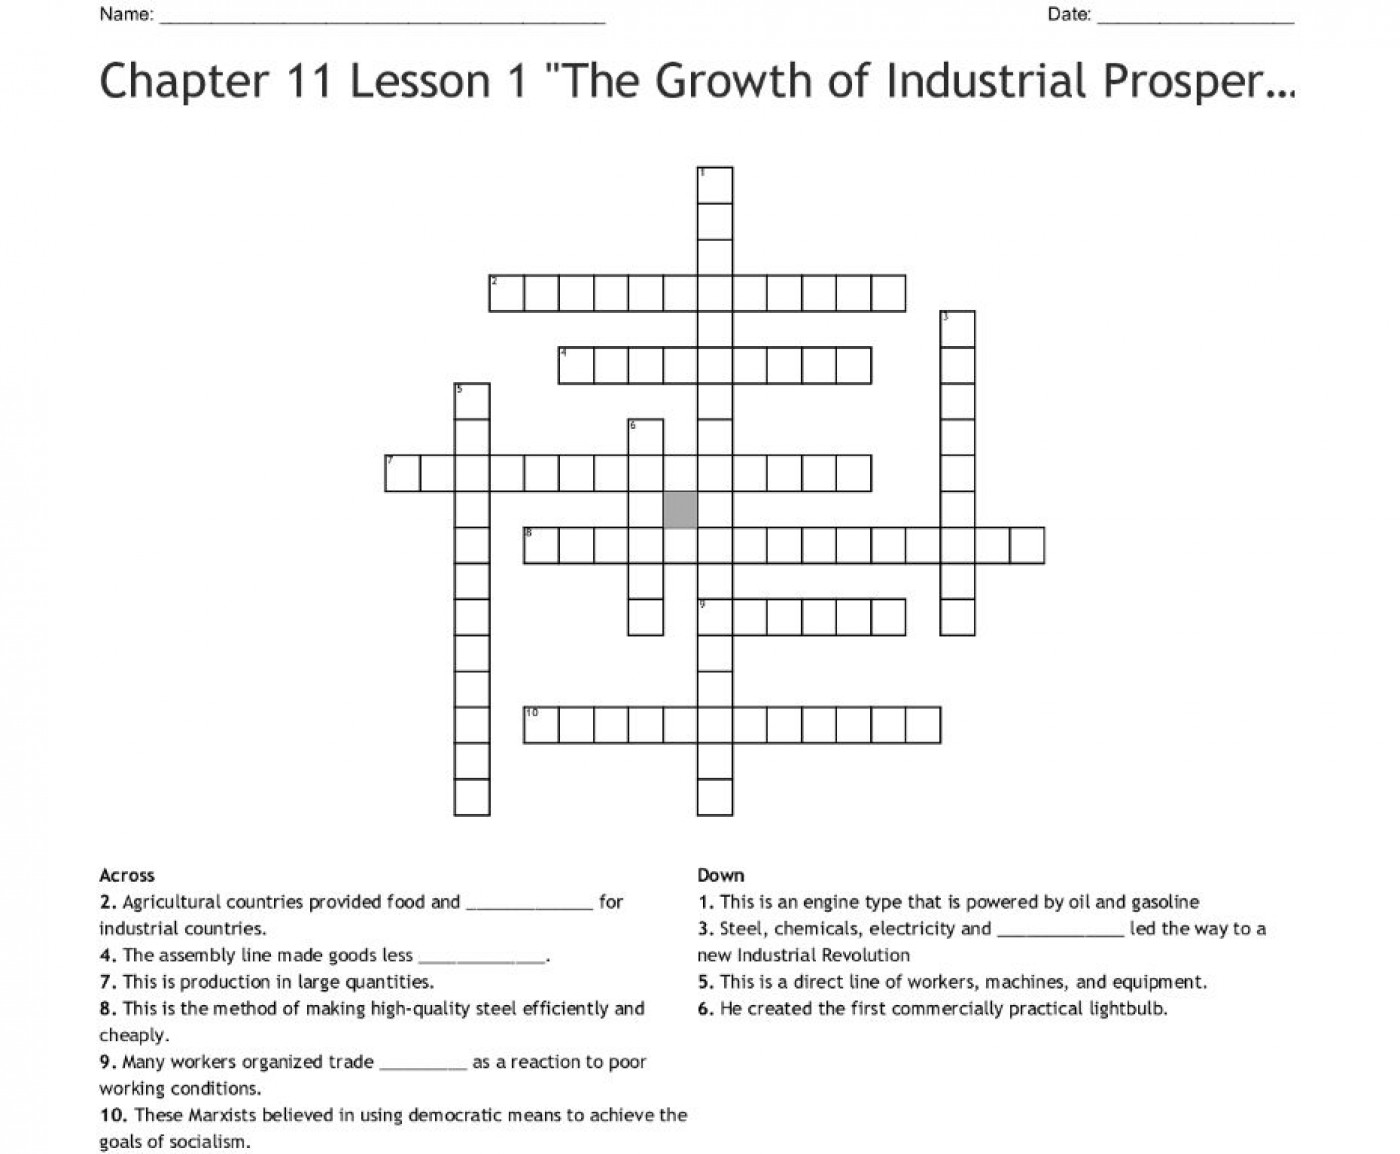 000 Unbelievable Prosperity Crossword Design  Sound Clue Material1400